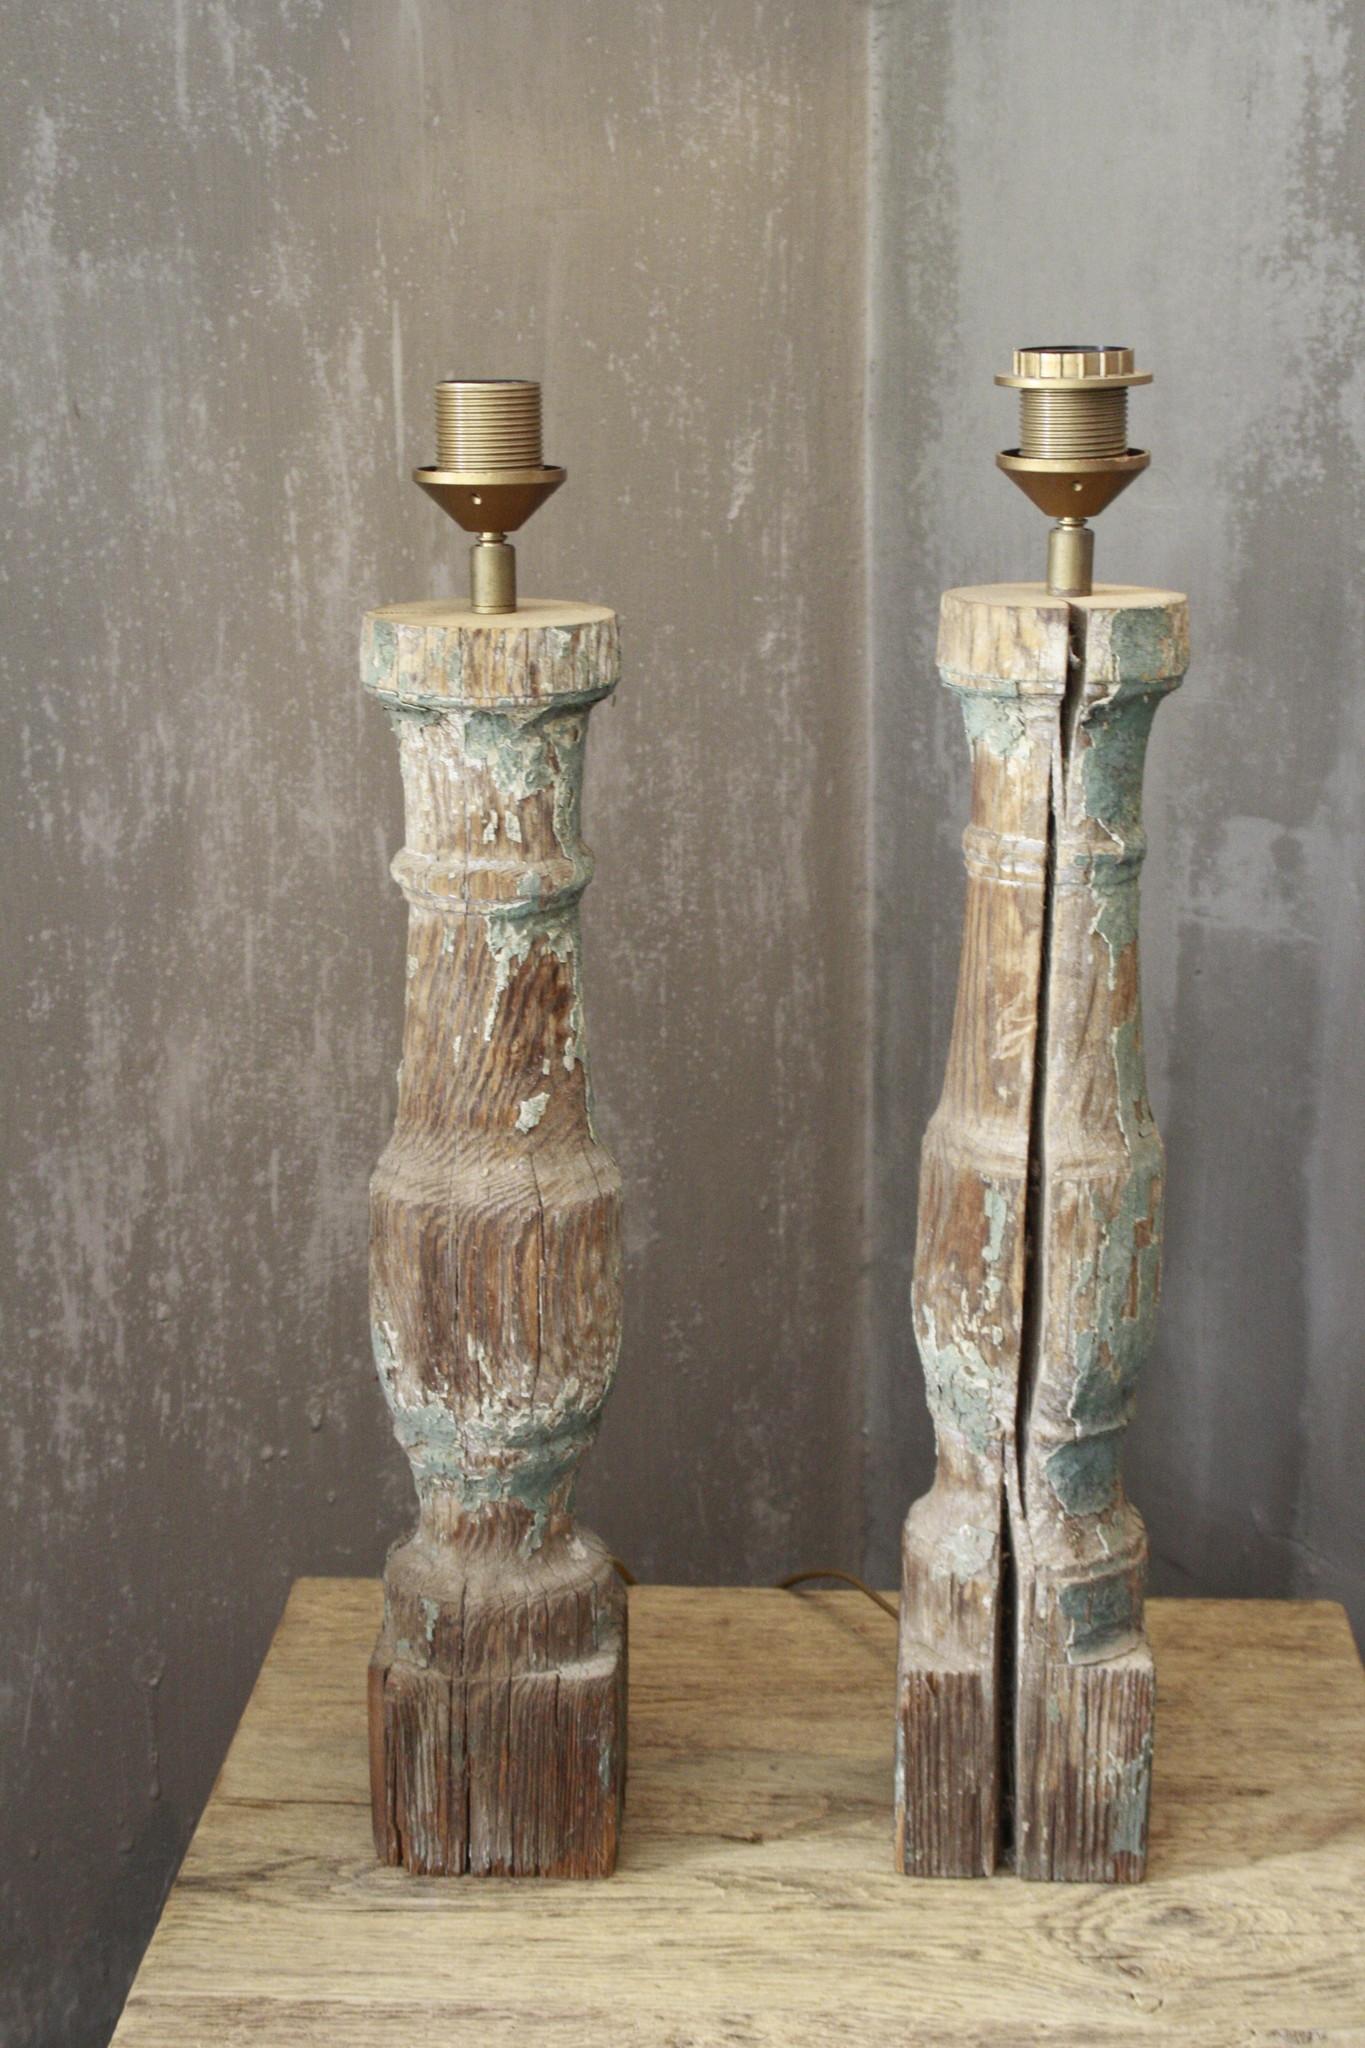 SET 2x Balusterlamp Oud Hout Groen tint 60 cm-4